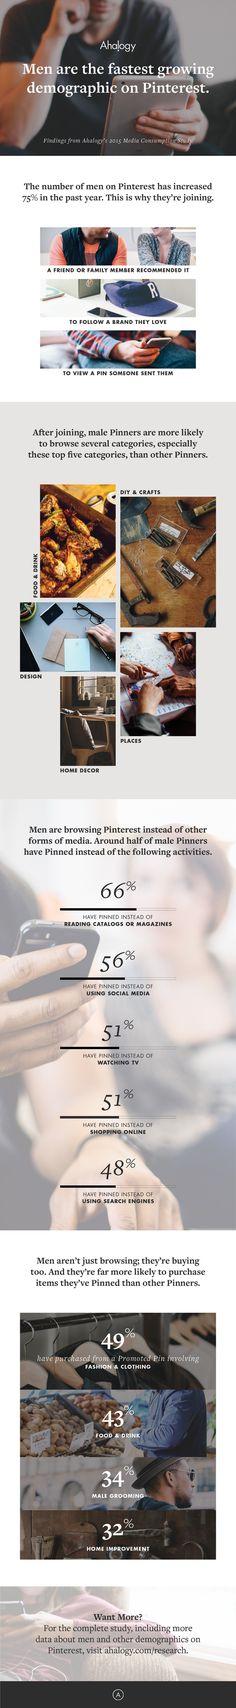 INFOGRAPHIC: MEN ON PINTEREST — Ahalogy Content Marketing Strategy, Social Media Marketing, Business Marketing, Digital Marketing, Media Studies, Pinterest For Business, Pinterest Marketing, Platform, Meet